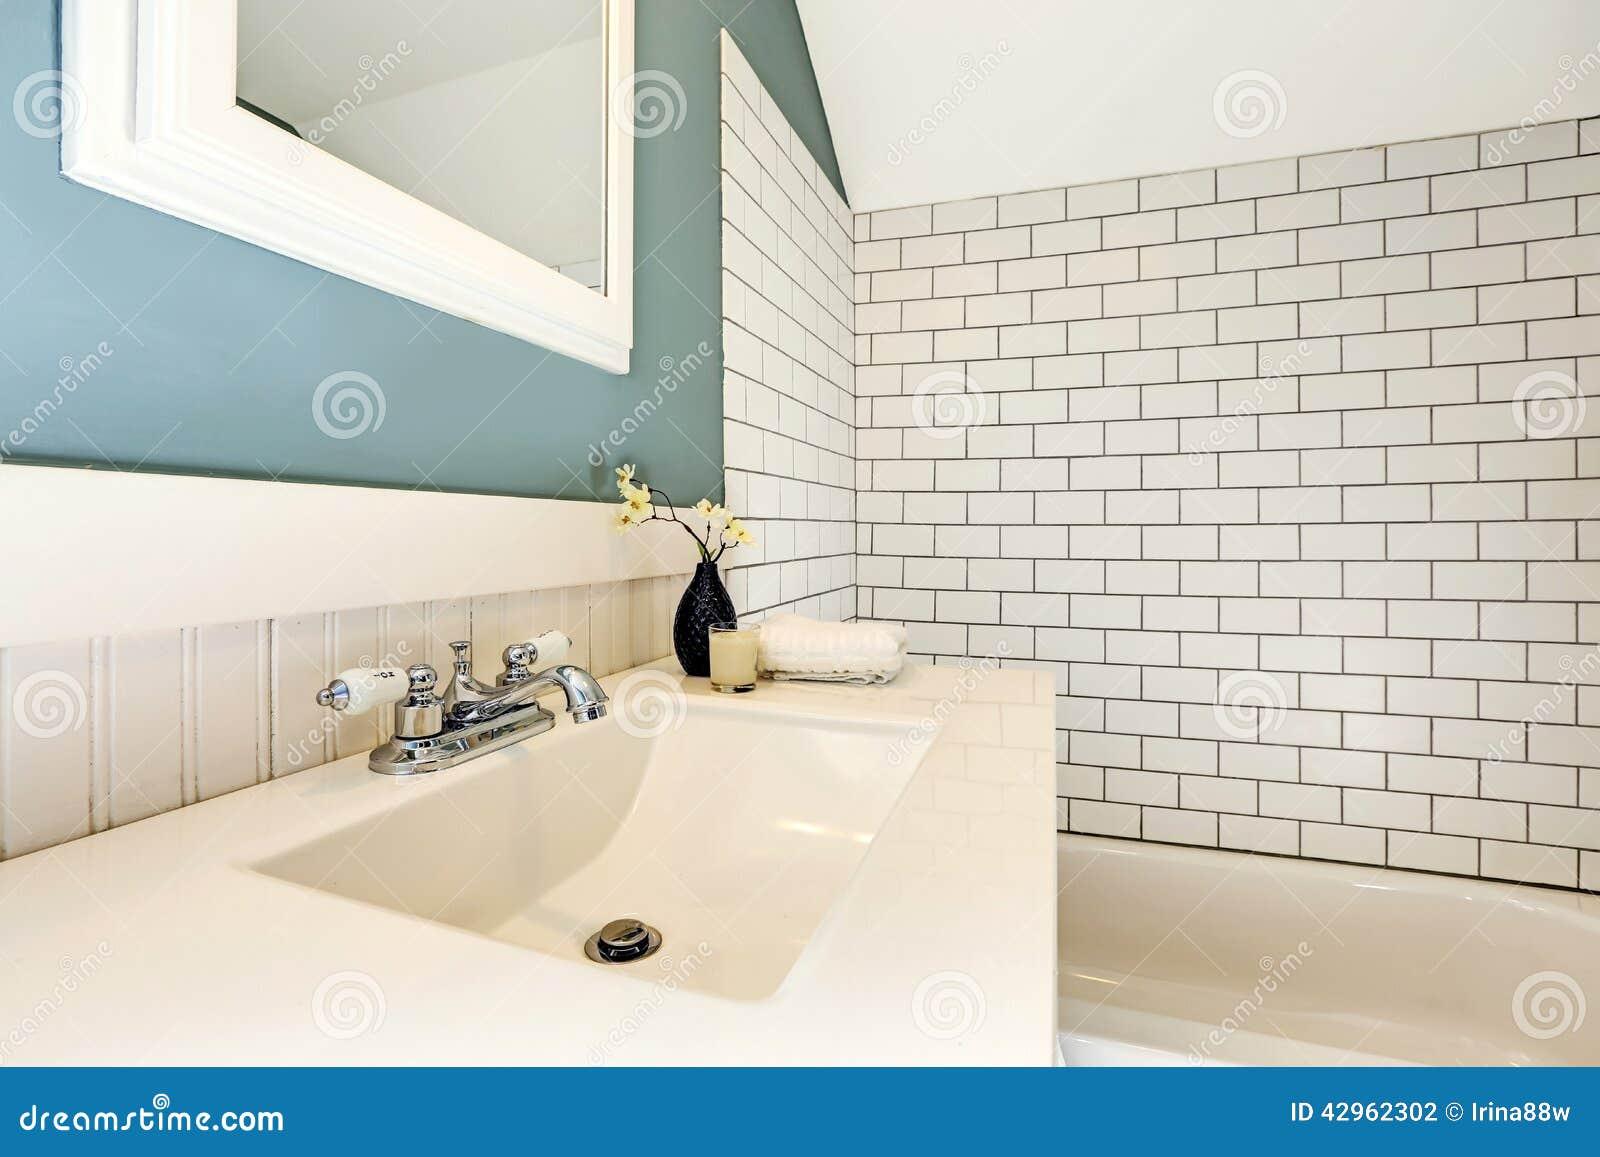 Aqua Bathroom With White Tile Wall Trim Stock Photo